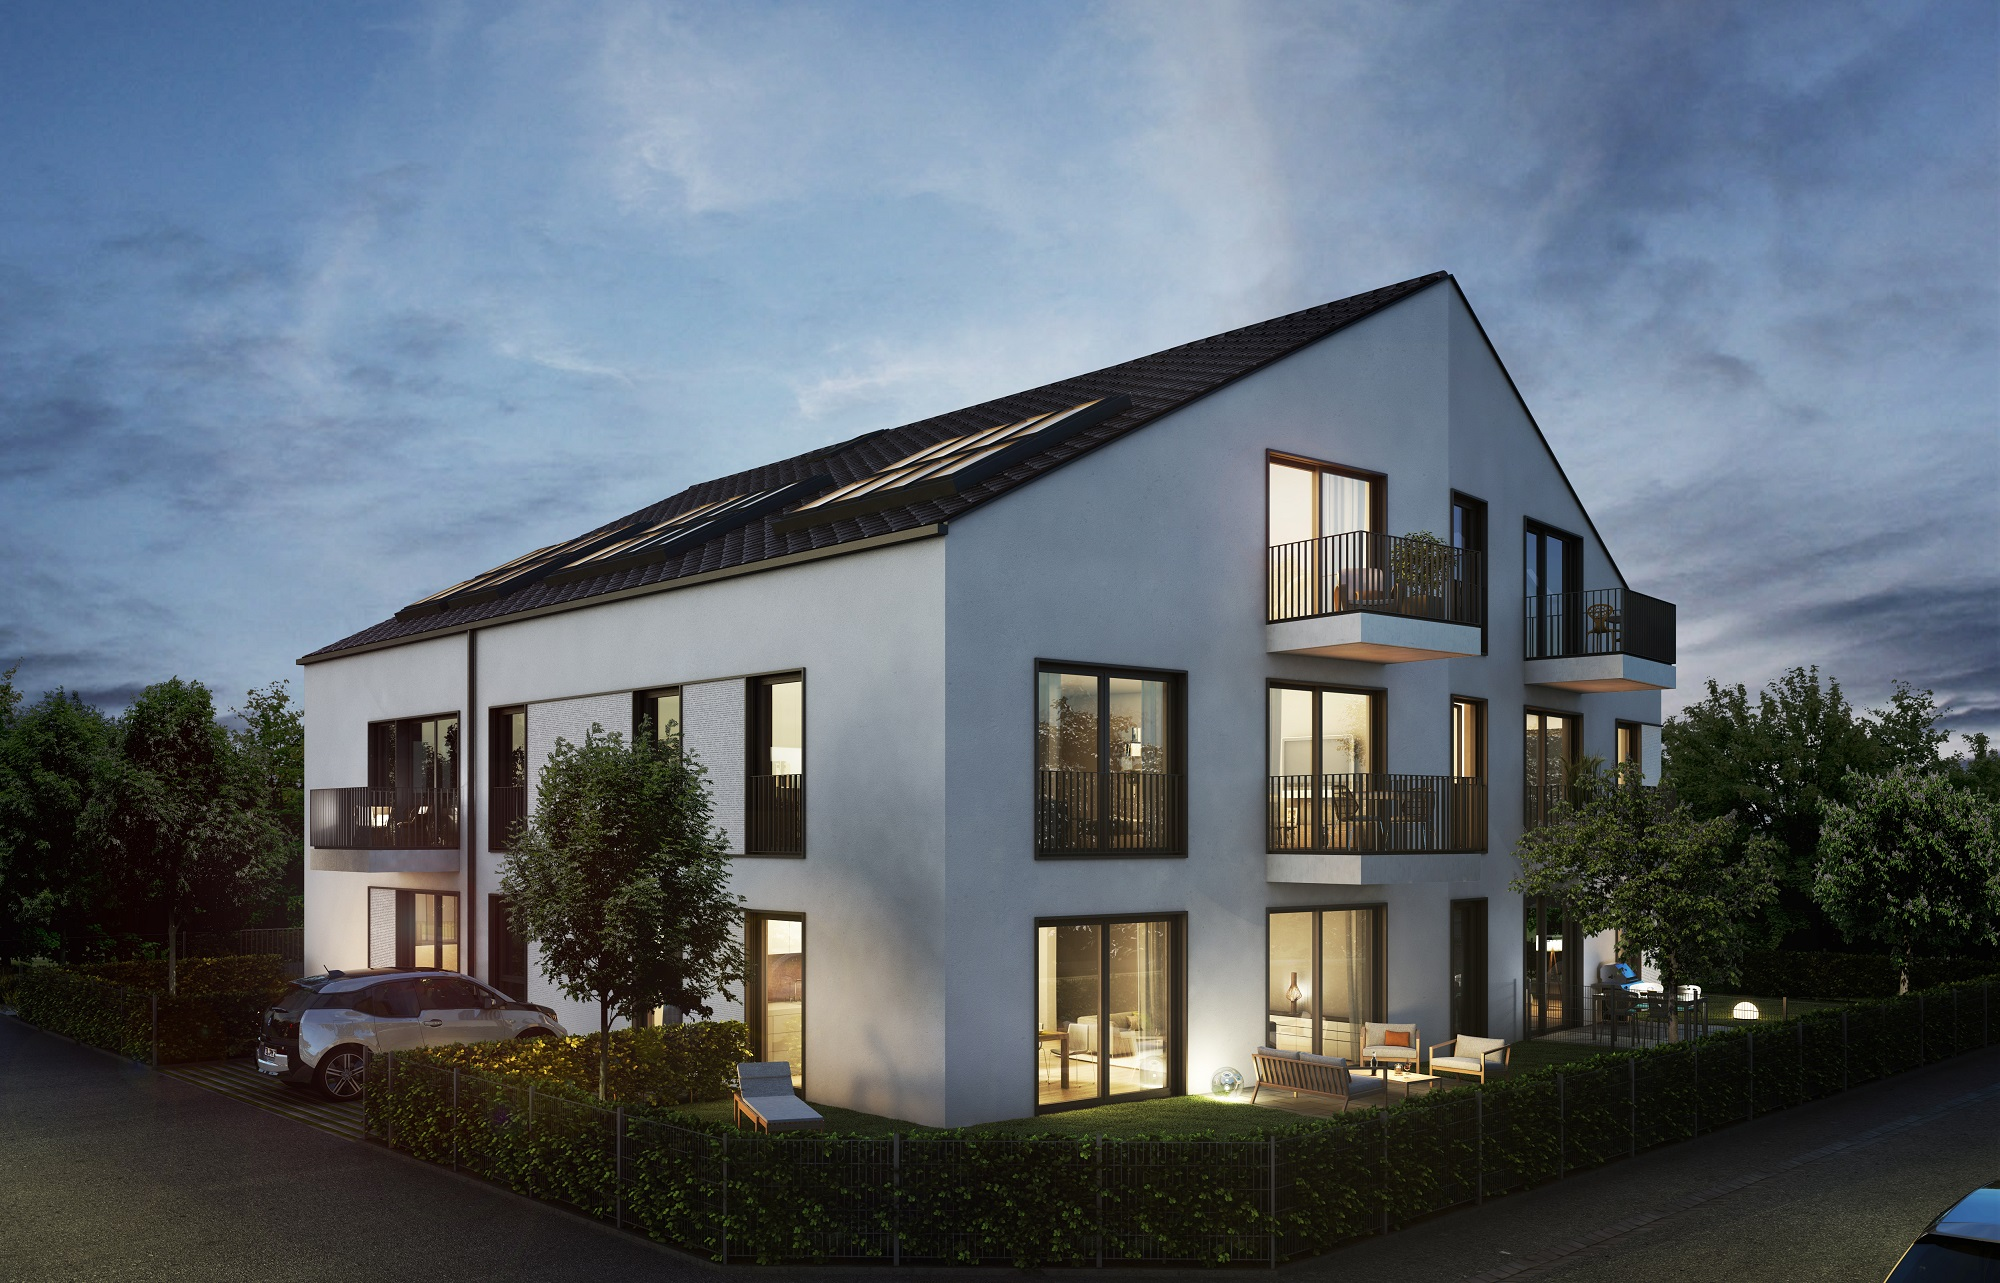 L HOMES Neubauimmobilie Tulpenweg, Wolfratshausen